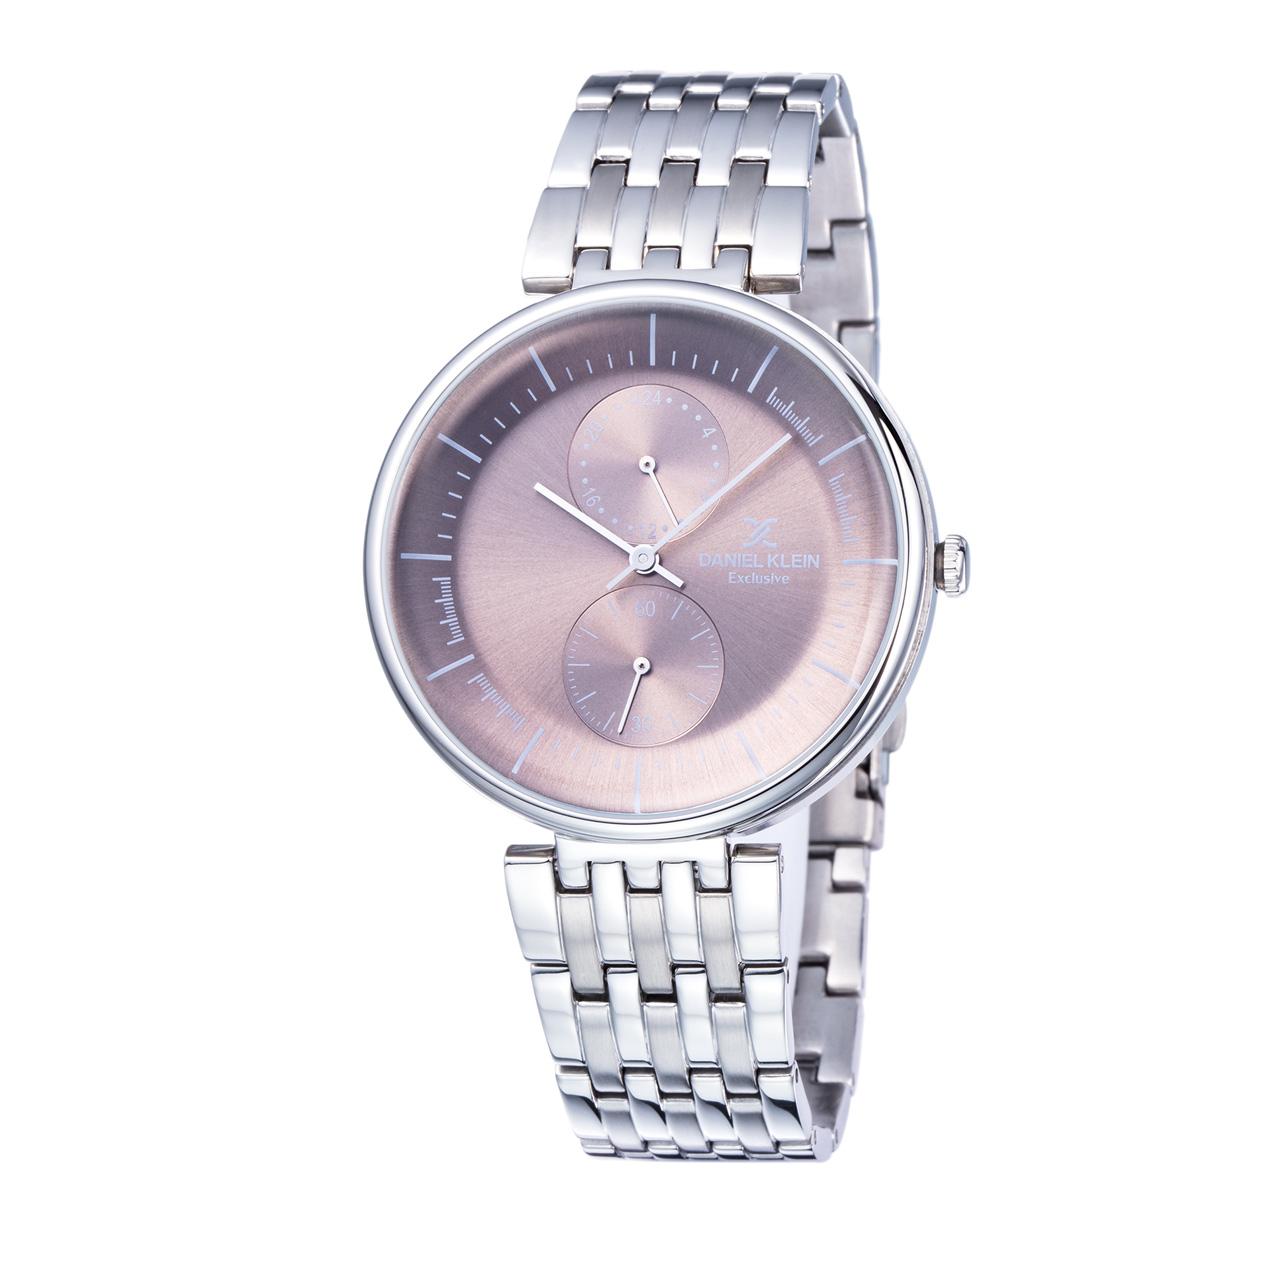 Ceas pentru barbati, Daniel Klein Exclusive, DK11900-5